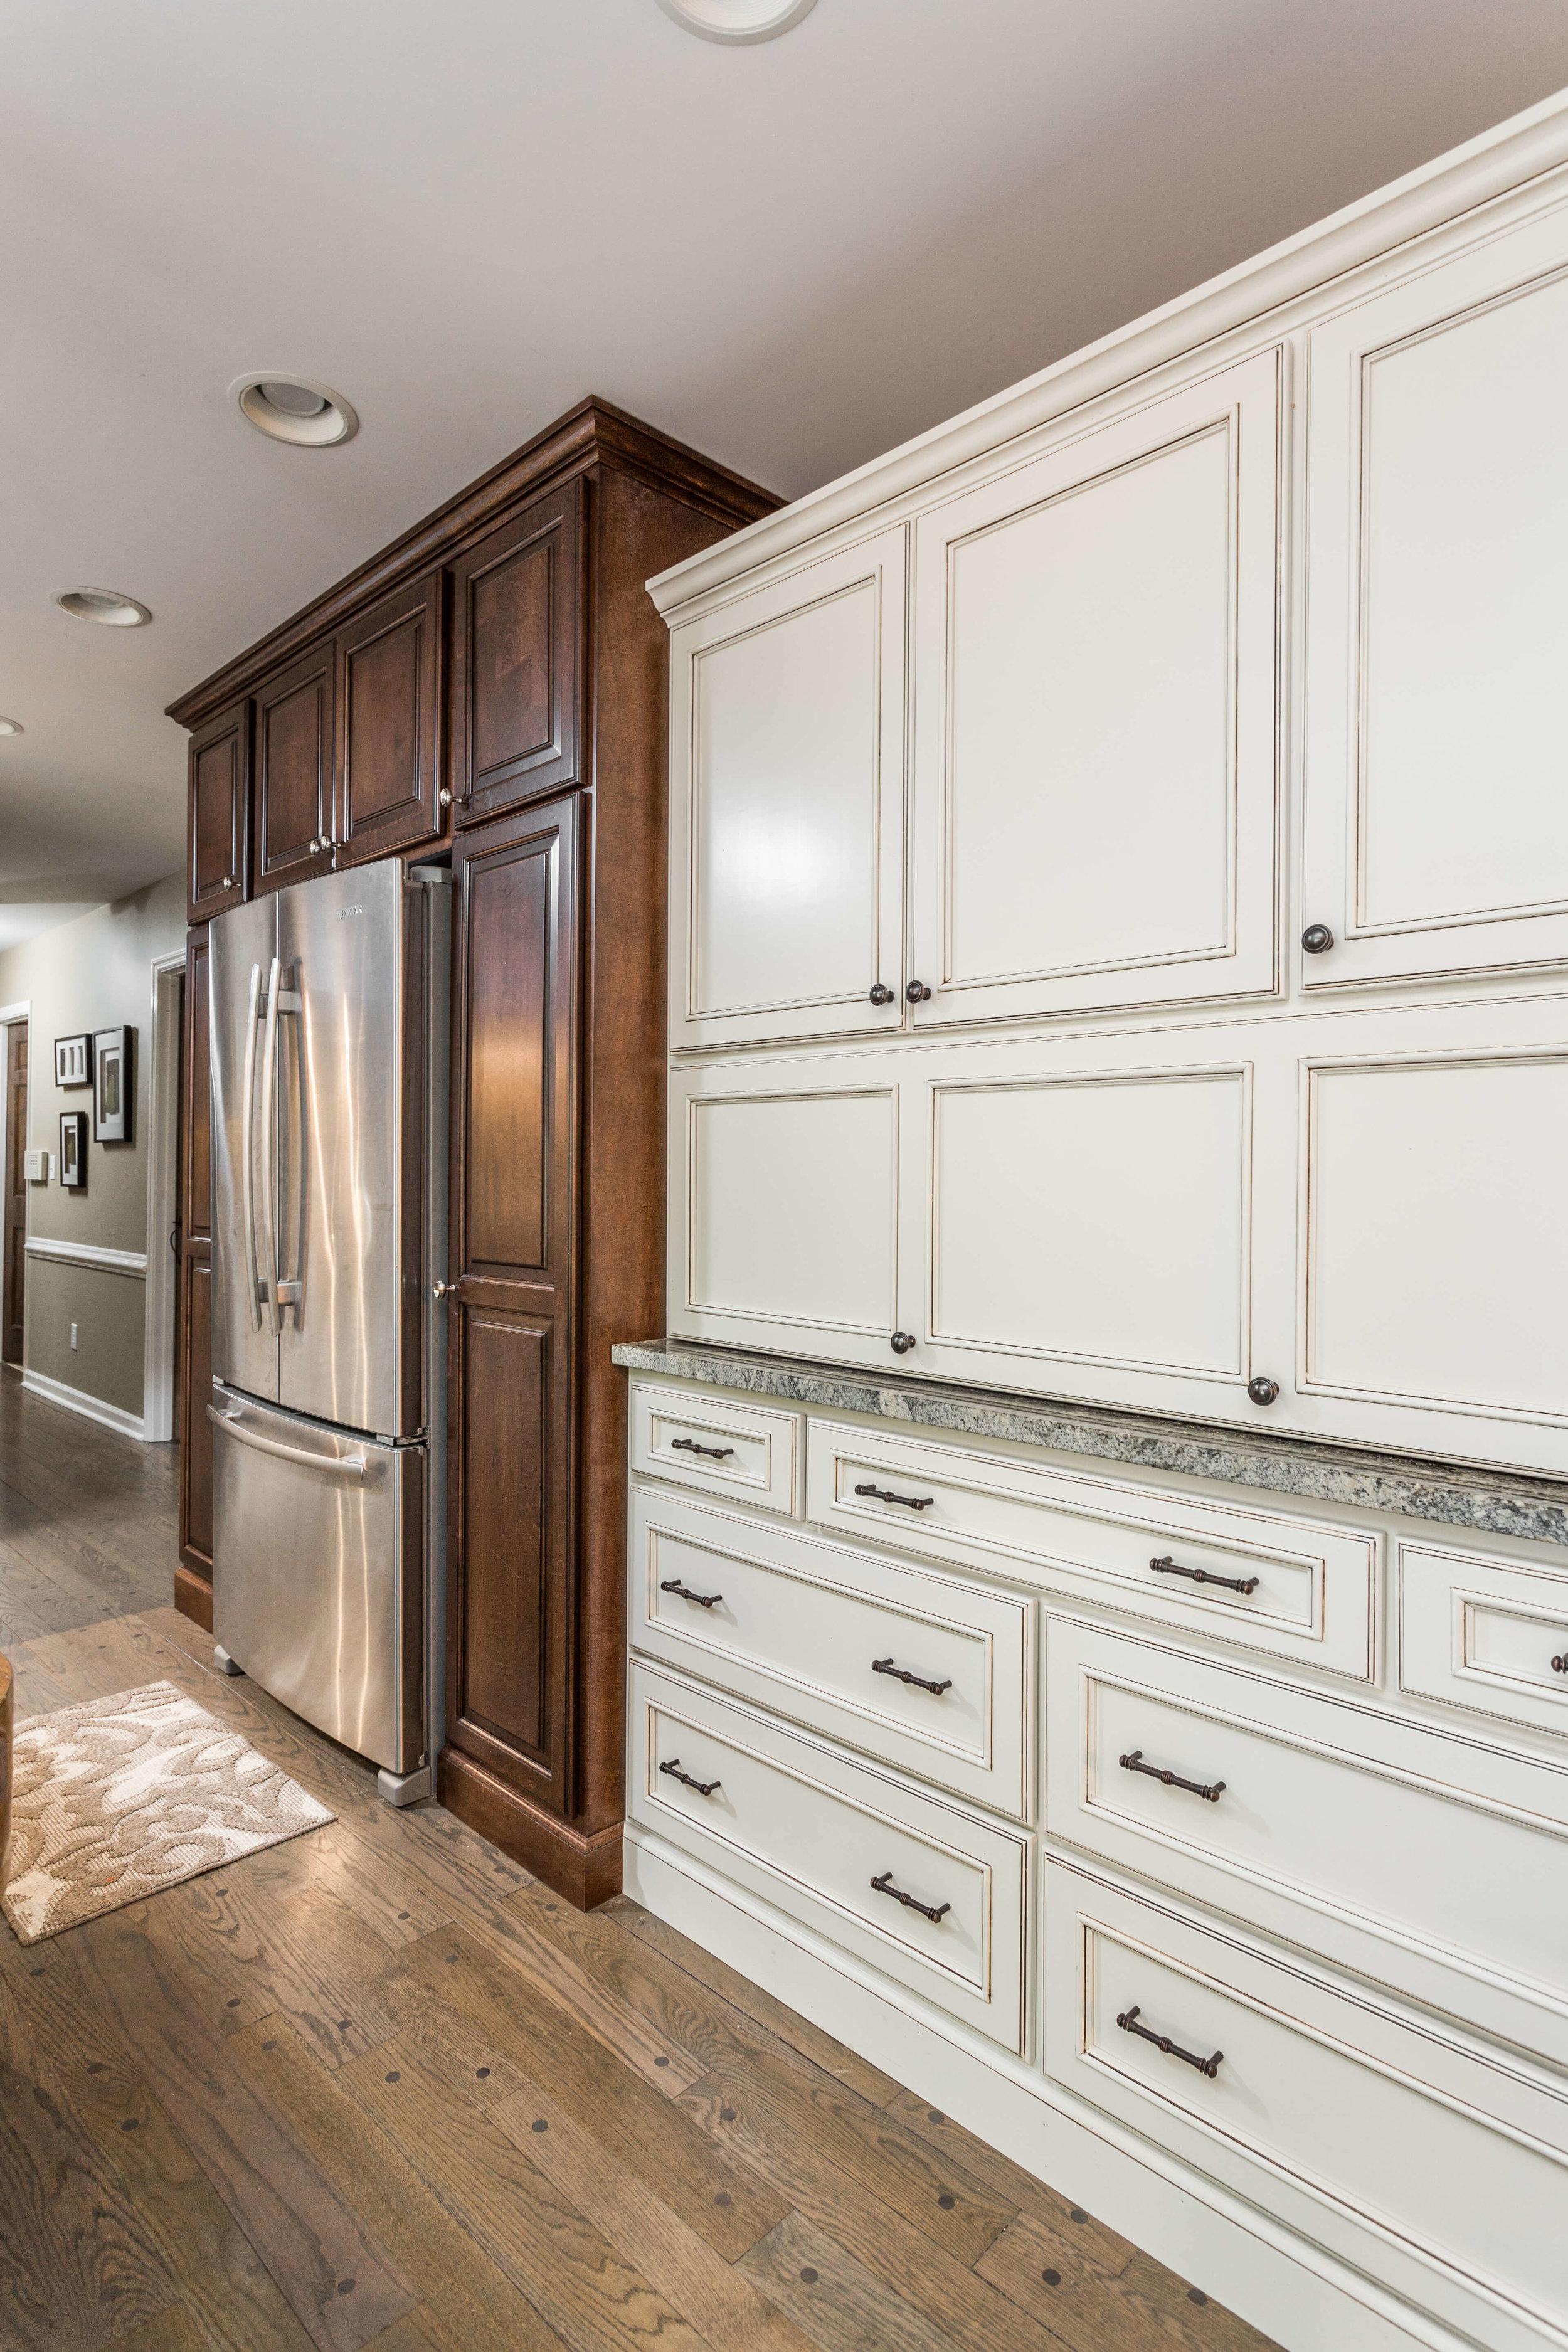 transitionalwarmth - Kitchen Remodel